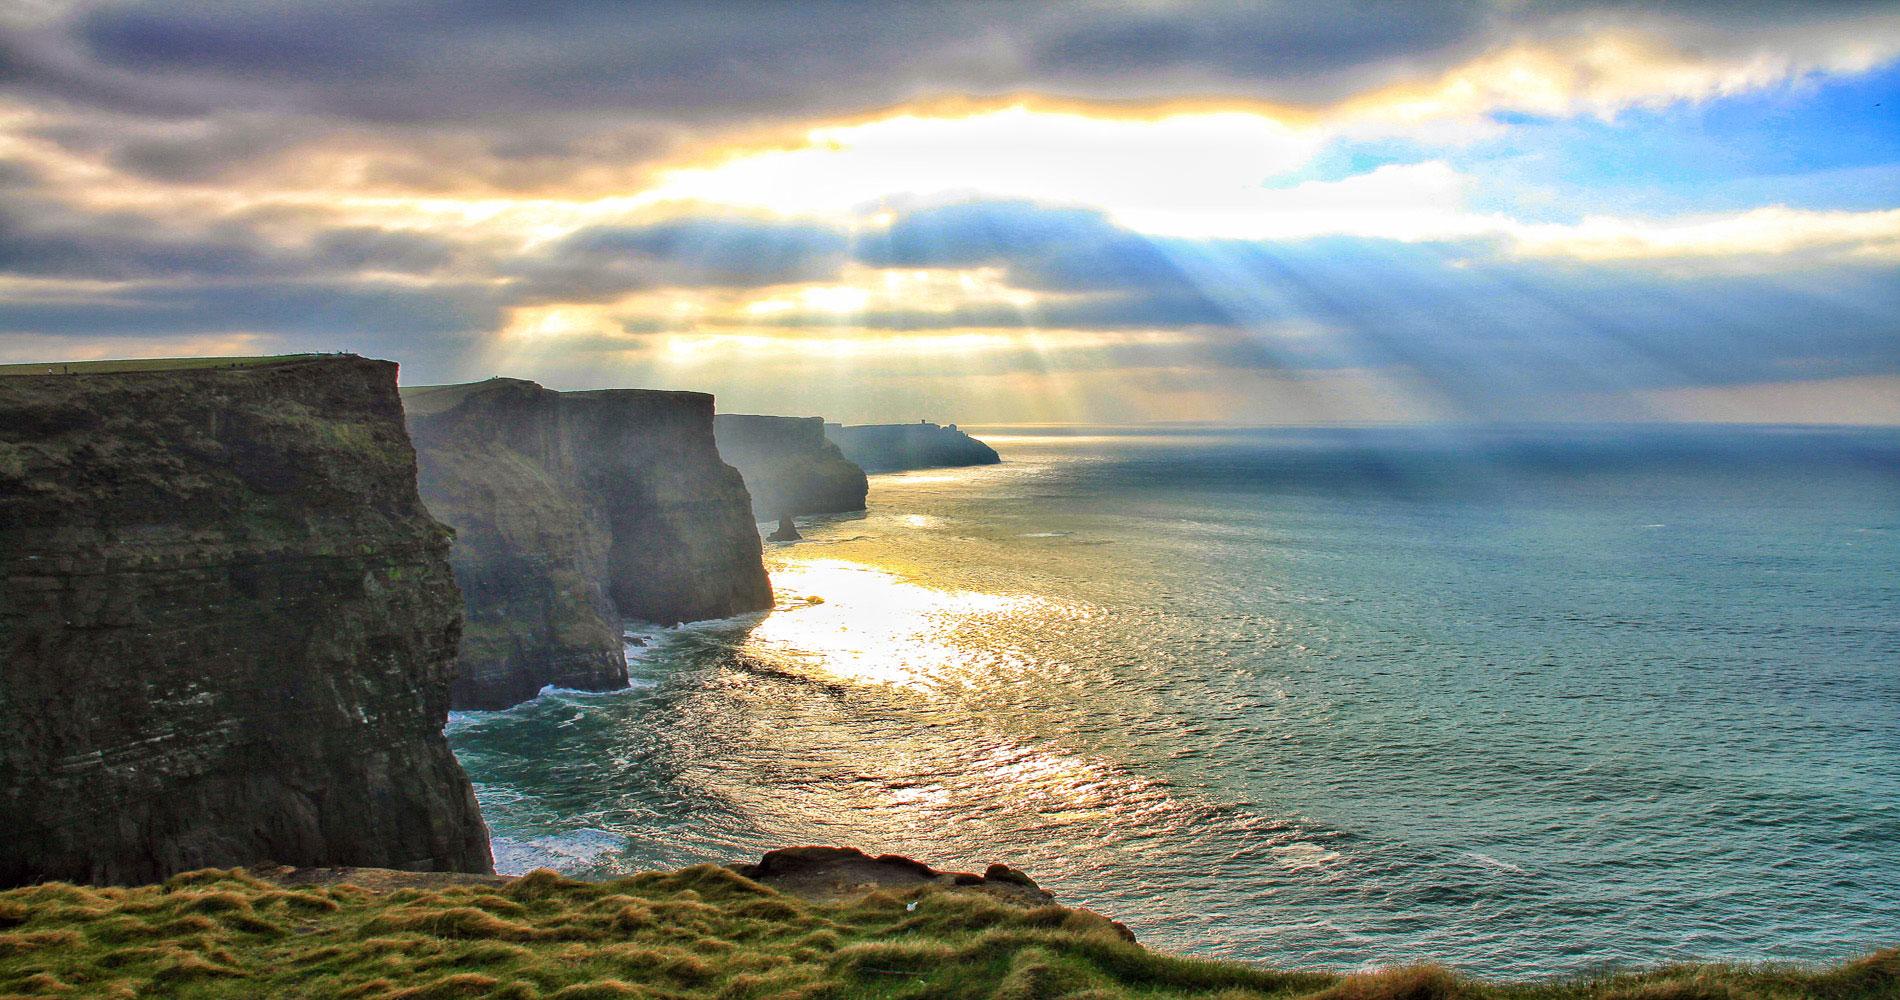 Cliffs Of Moher Ireland Blank Template